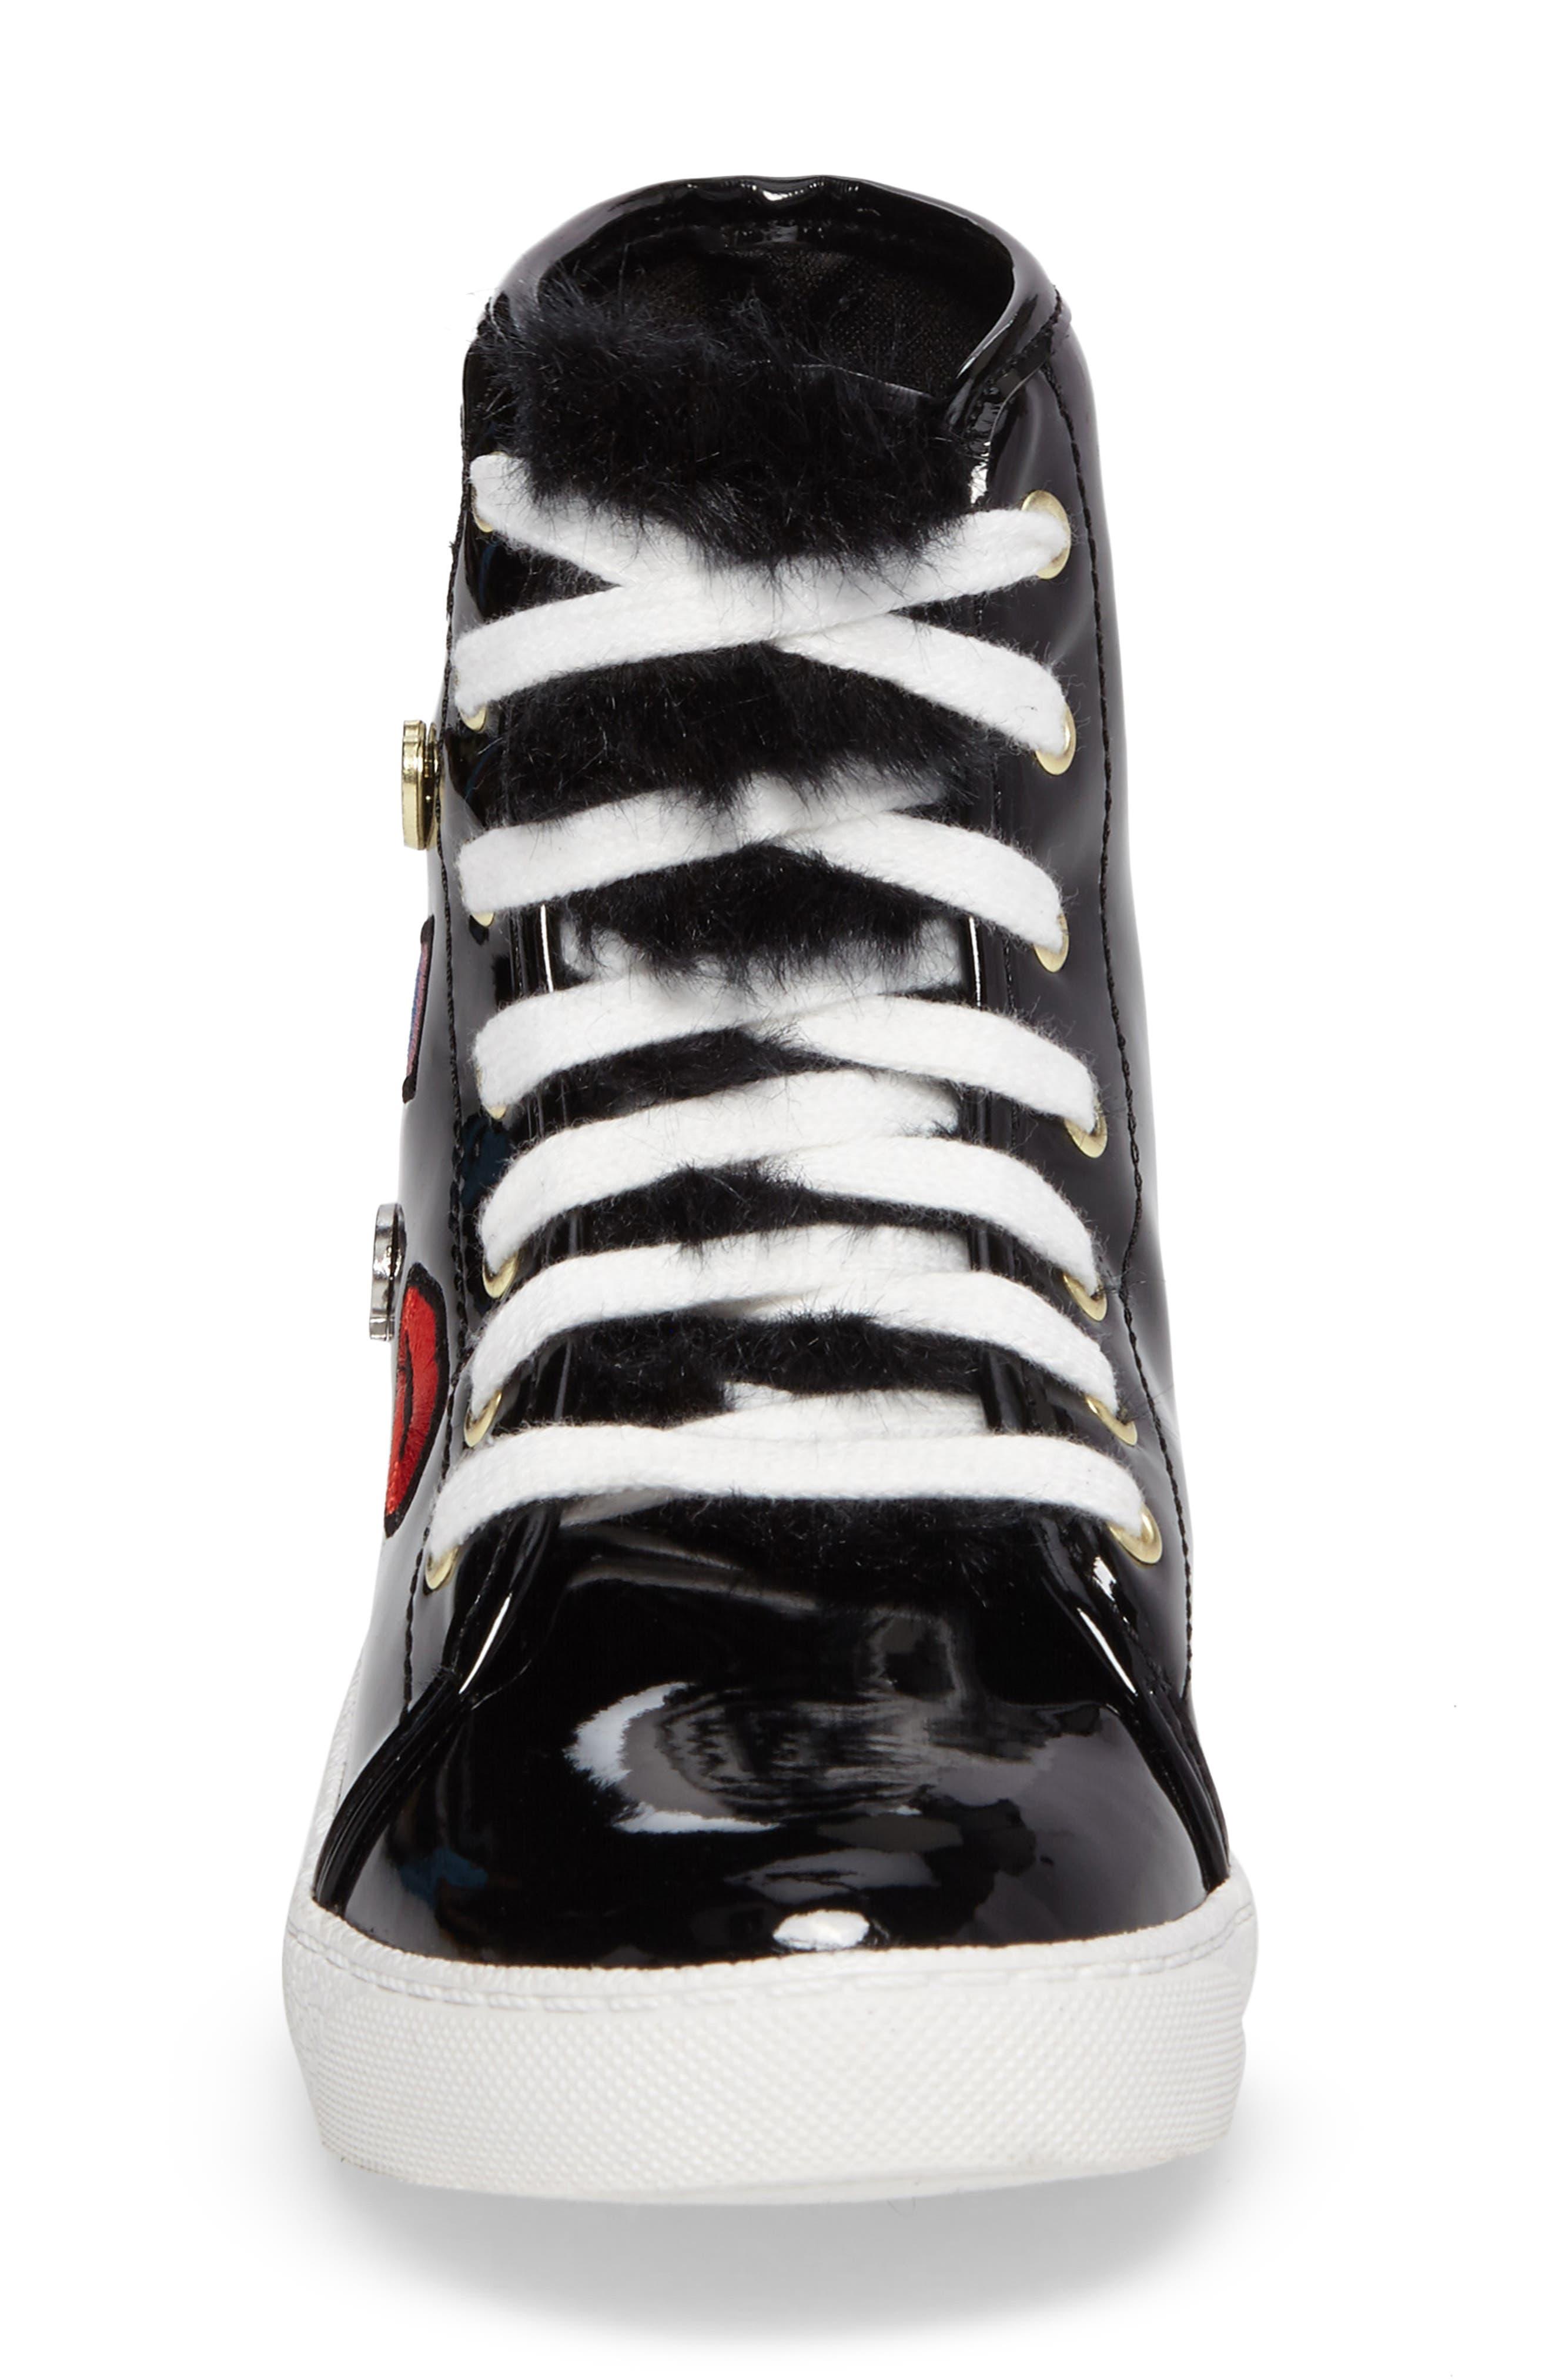 Harriet Heidi High-Top Sneaker,                             Alternate thumbnail 4, color,                             001